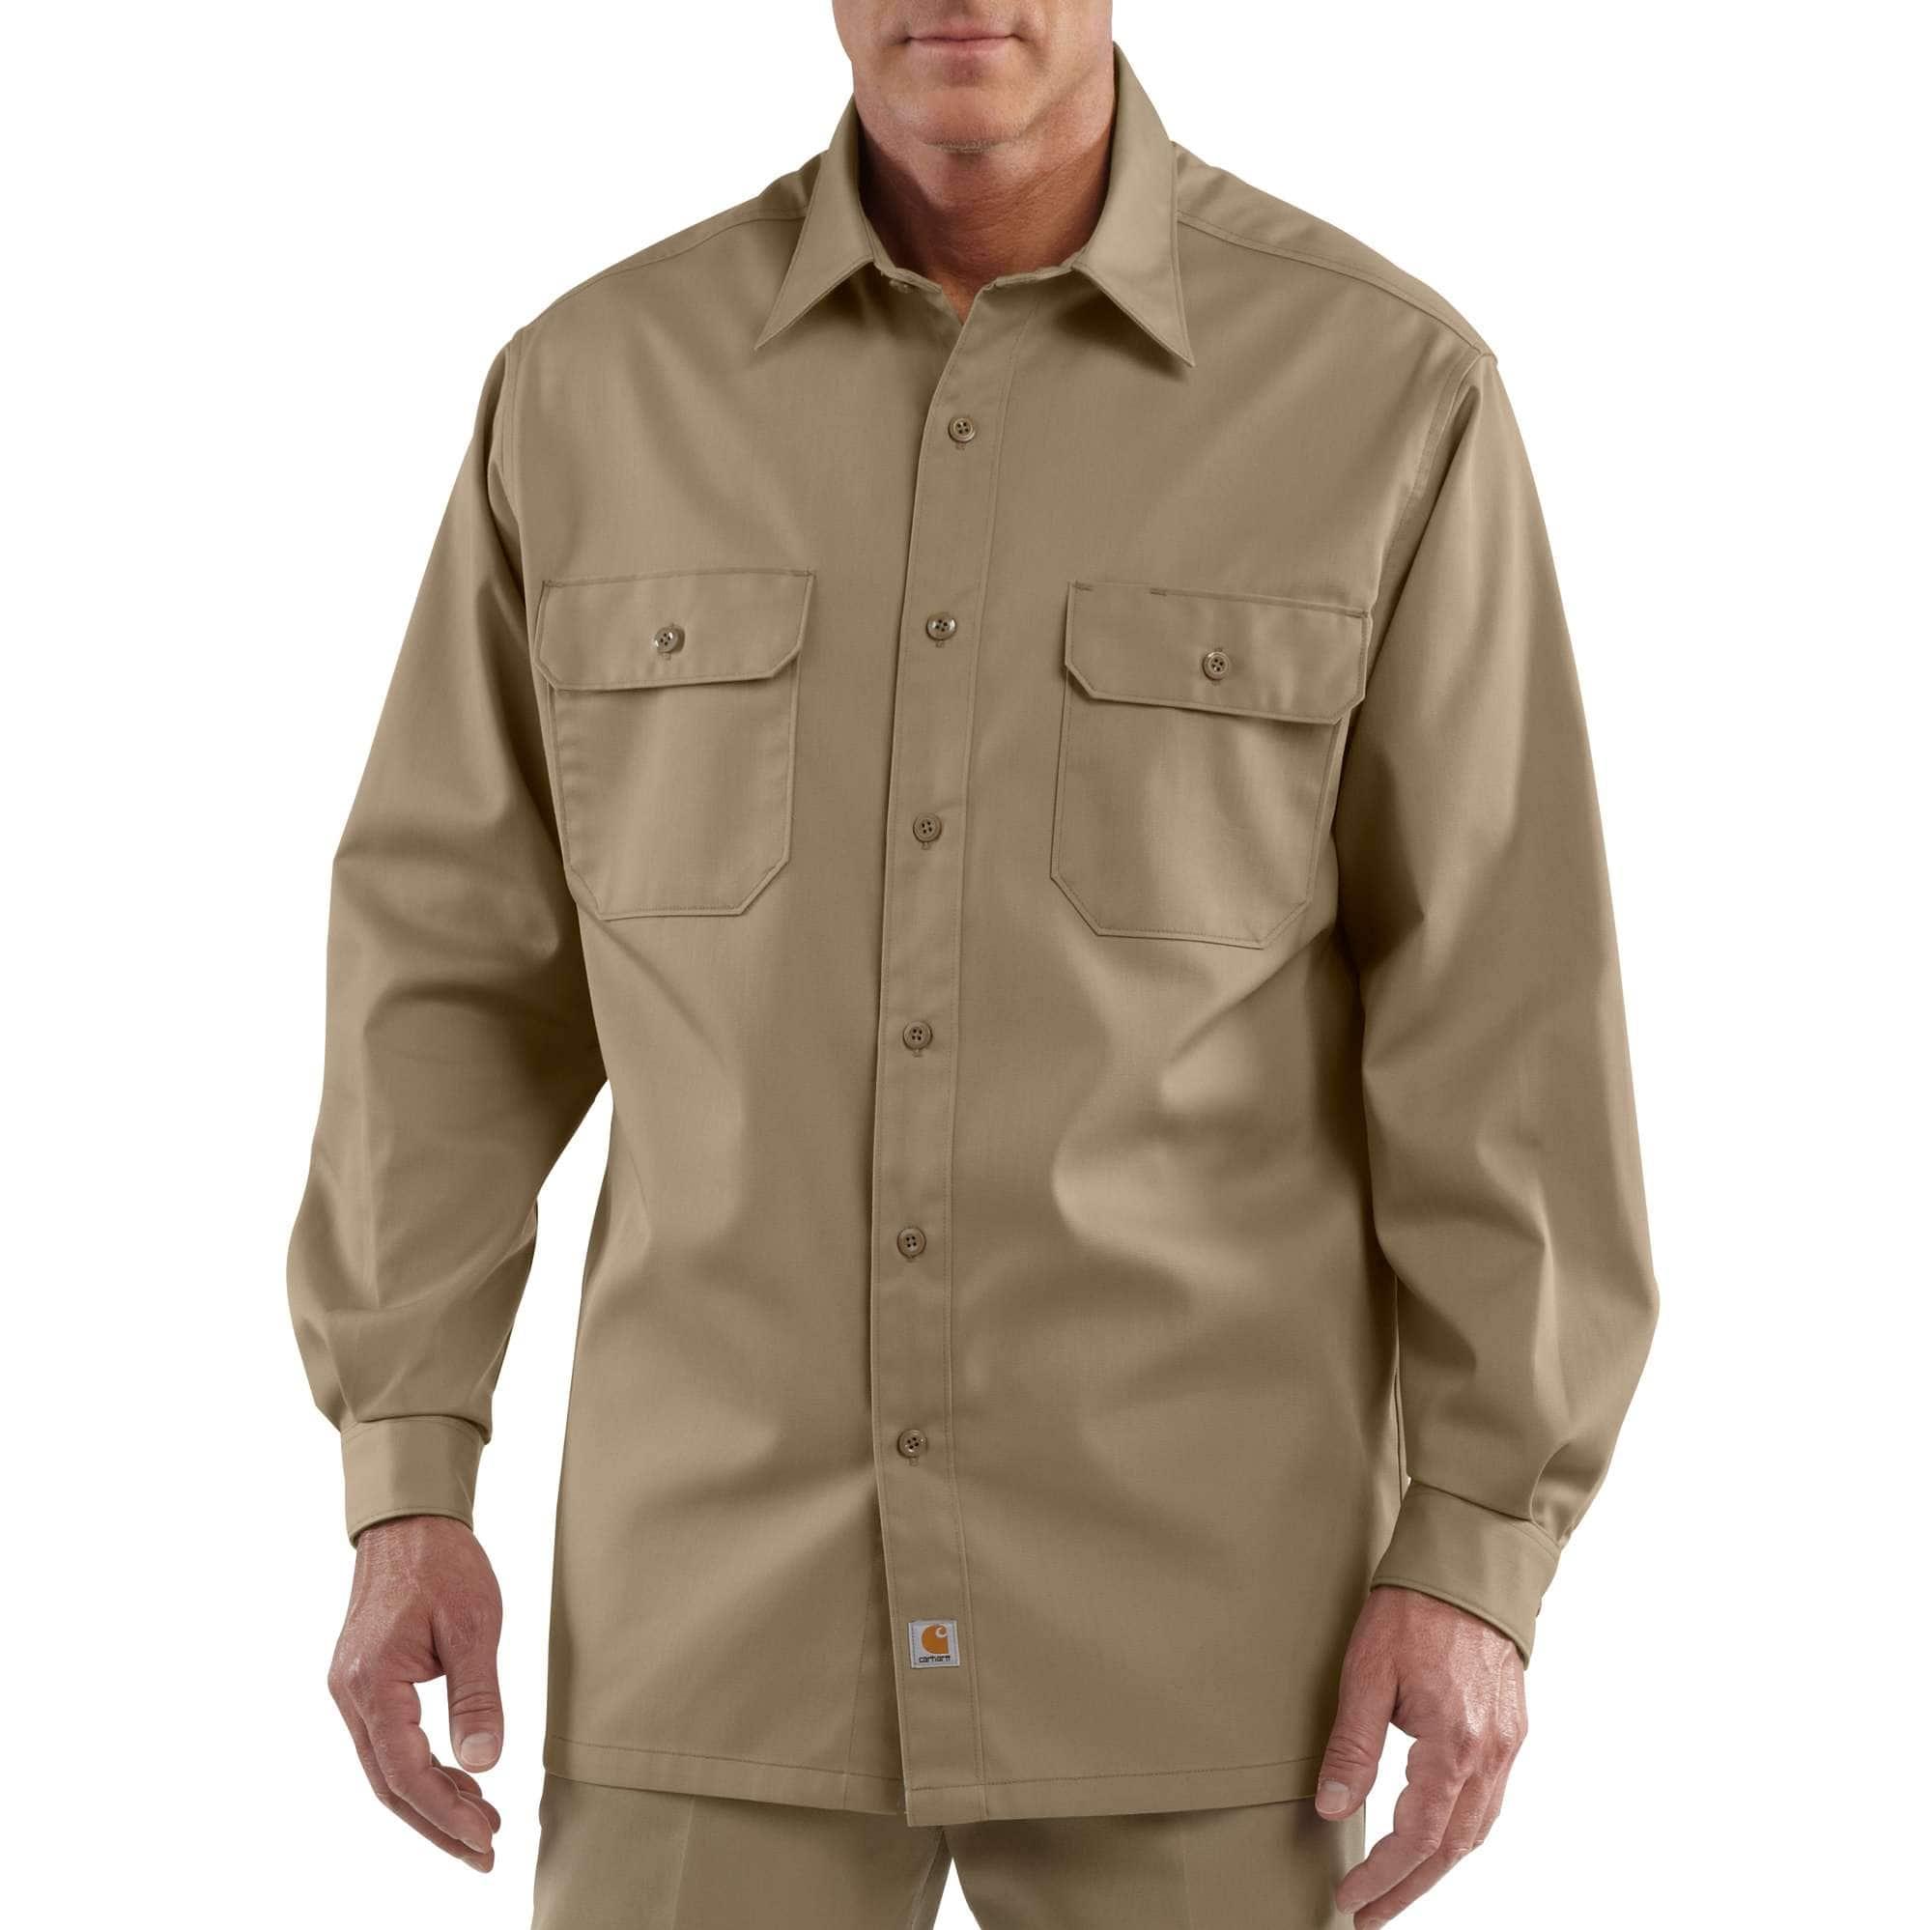 e98db59c07f Men s Long-Sleeve Twill Work Shirt S224